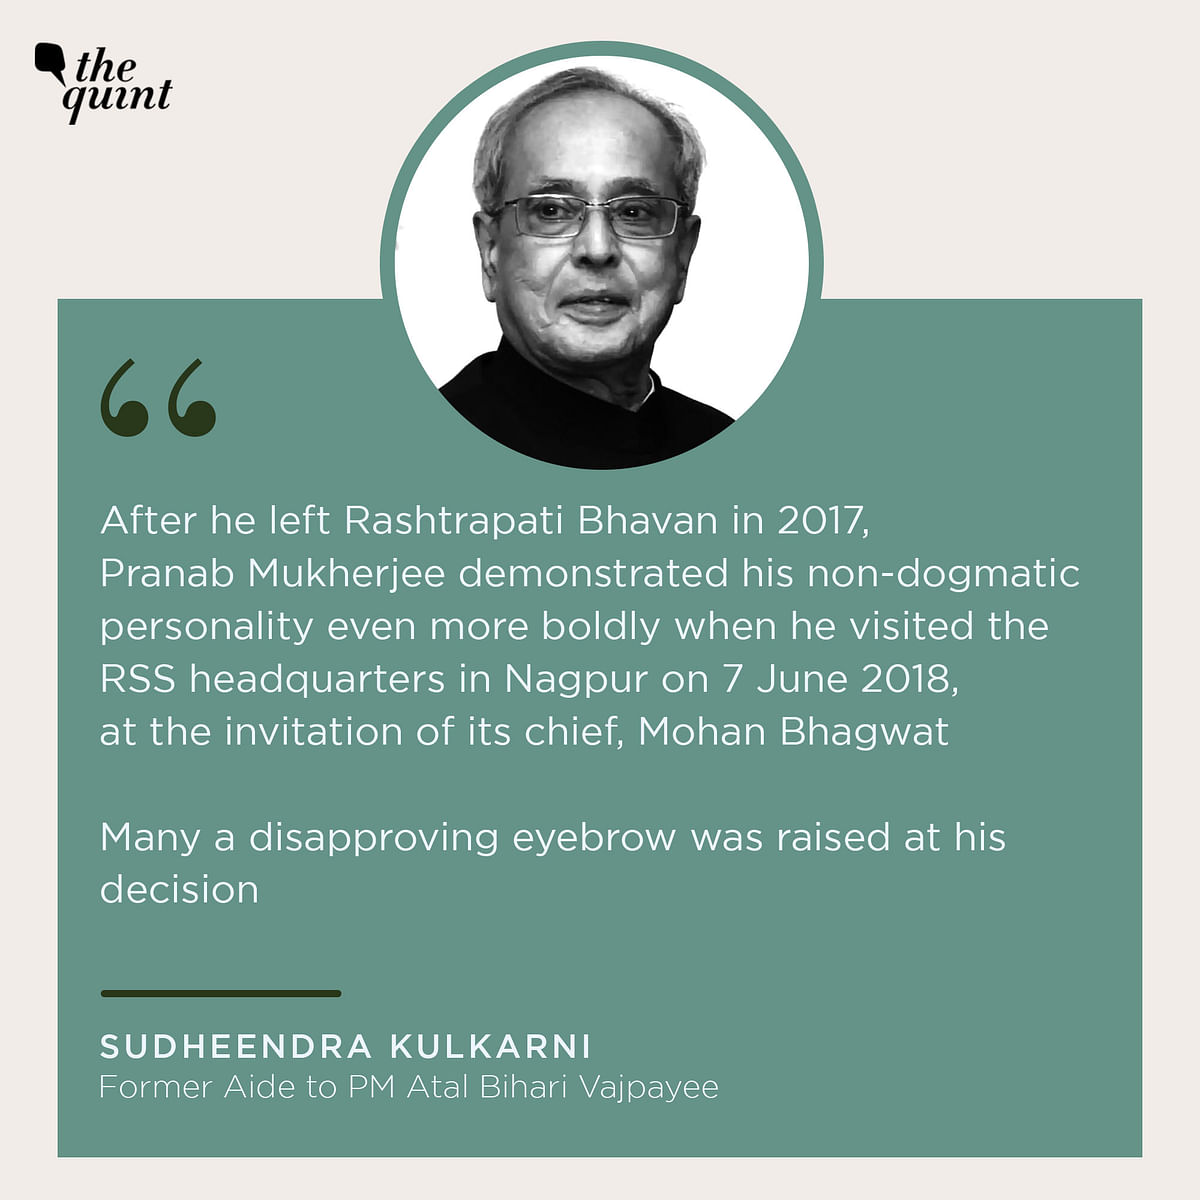 Pranab Mukherjee, India's 'Tall' Son, Was No Accidental President